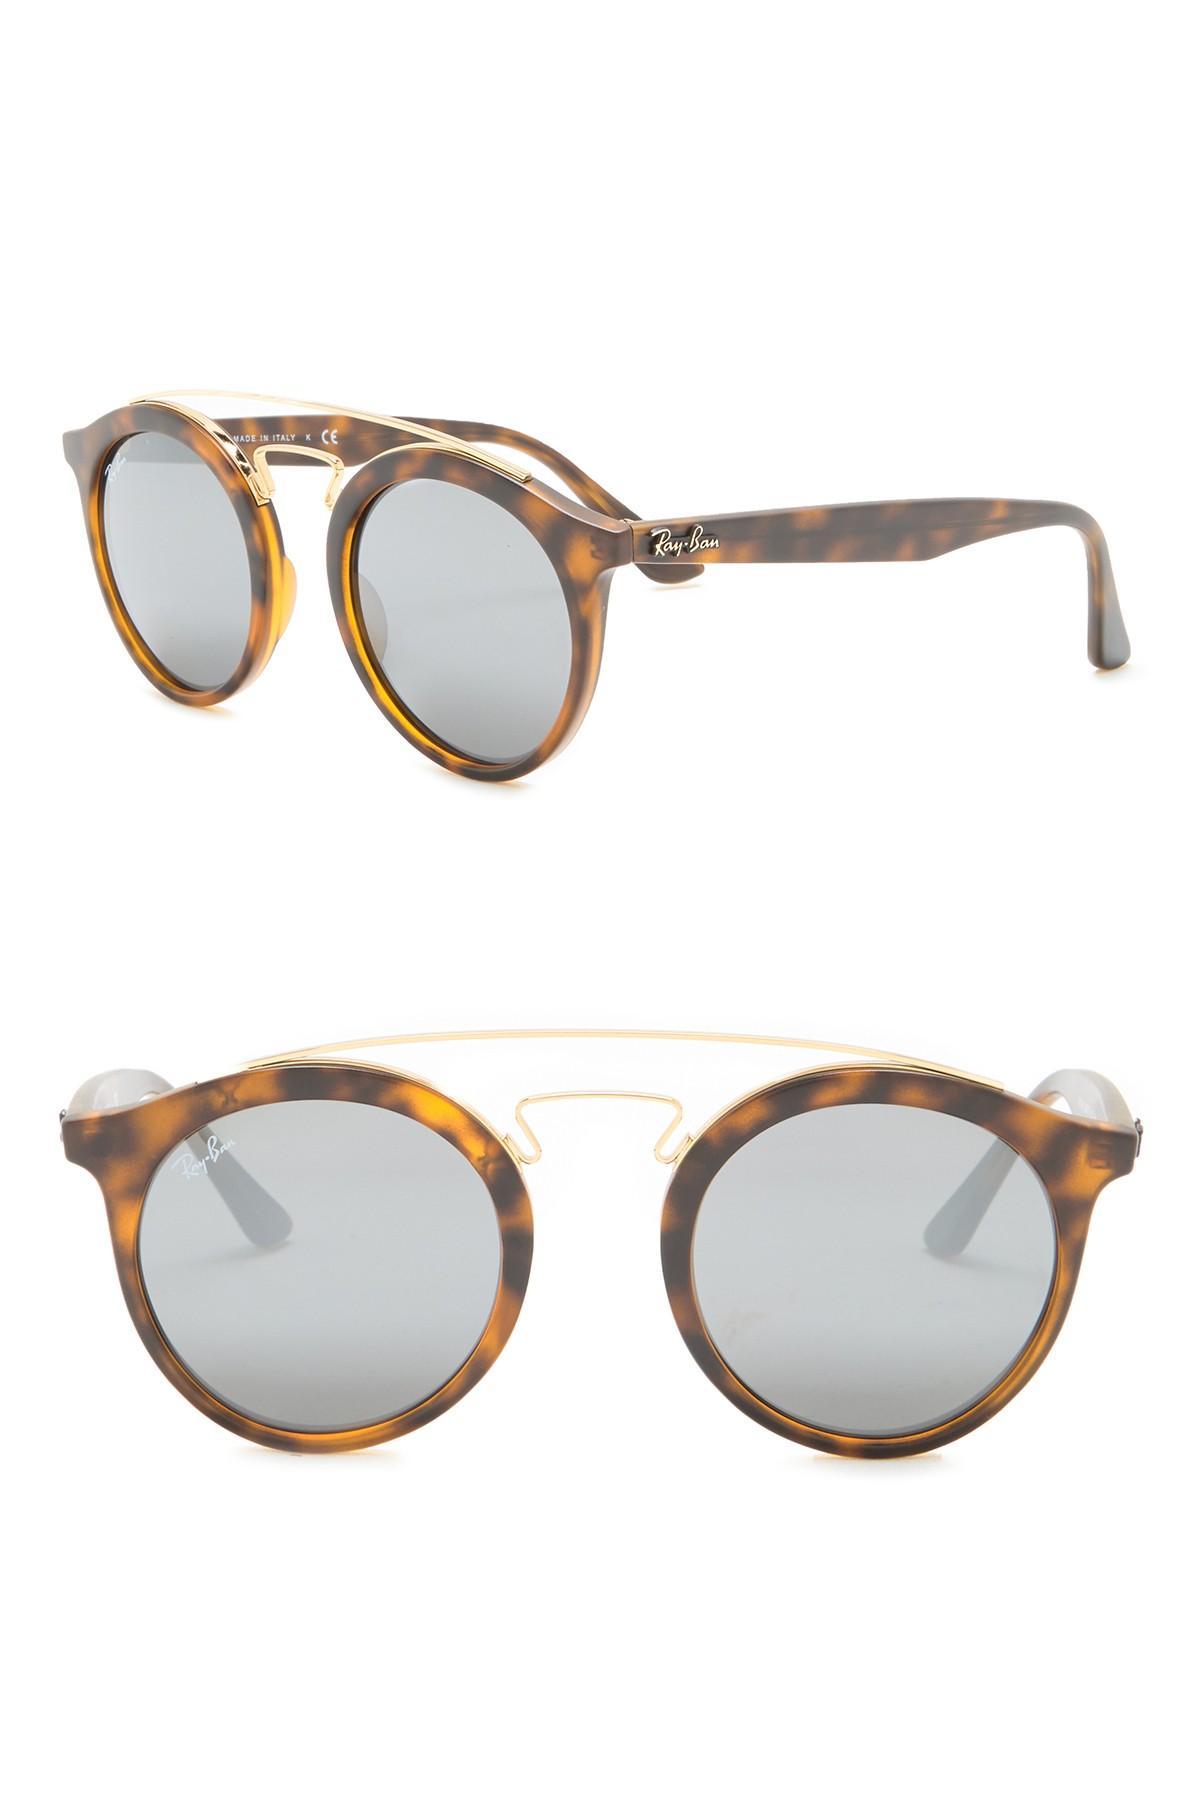 1edbfc8cdb Ray-Ban. Women s 46mm Phantos Sunglasses